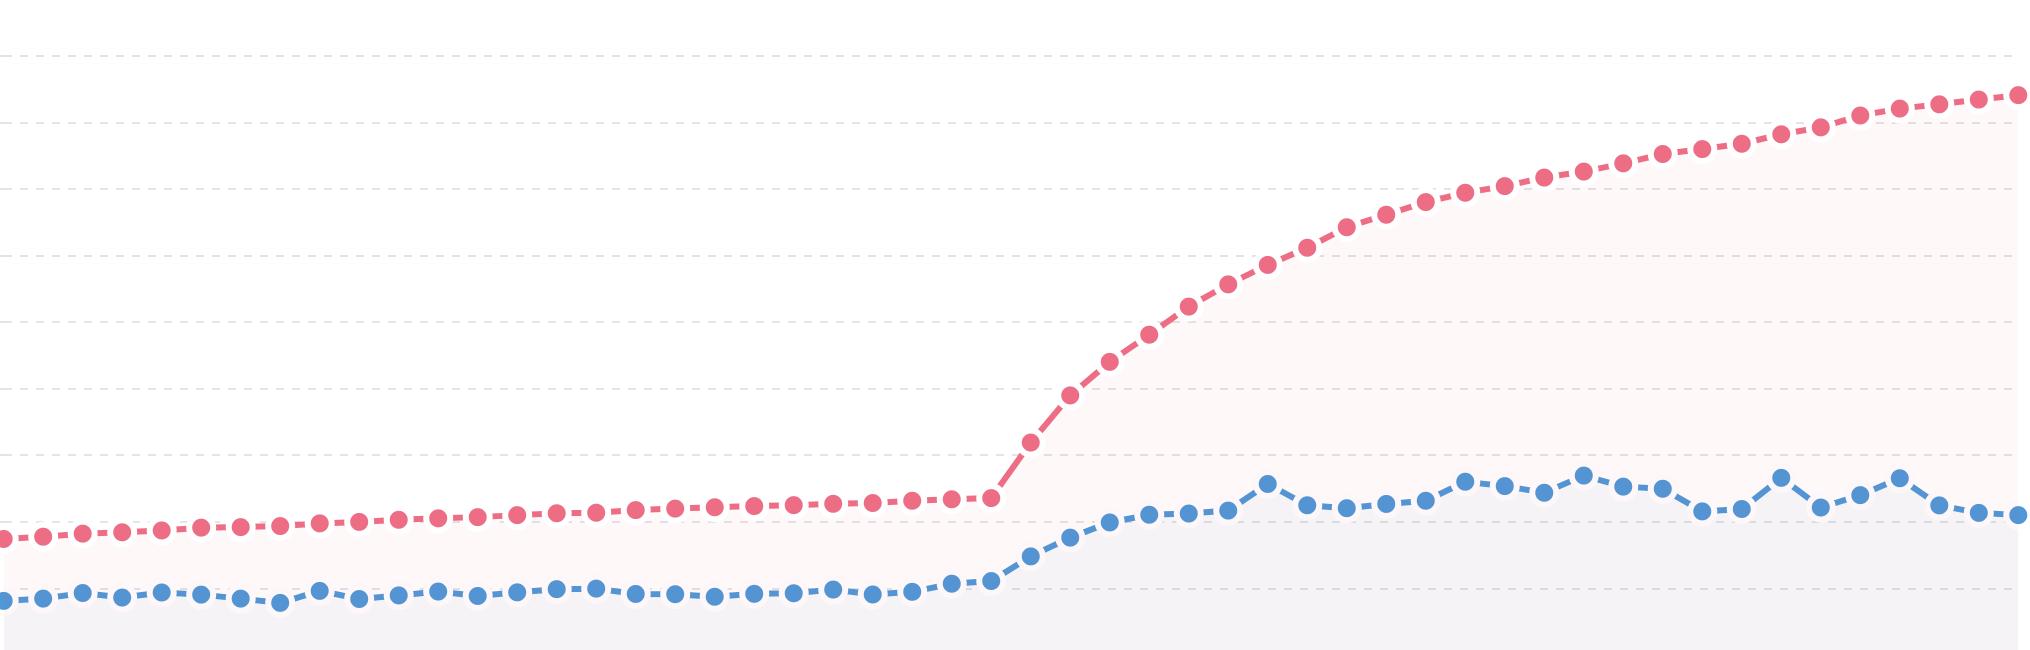 Red line: Subscriber number, Blue line: Unique opens